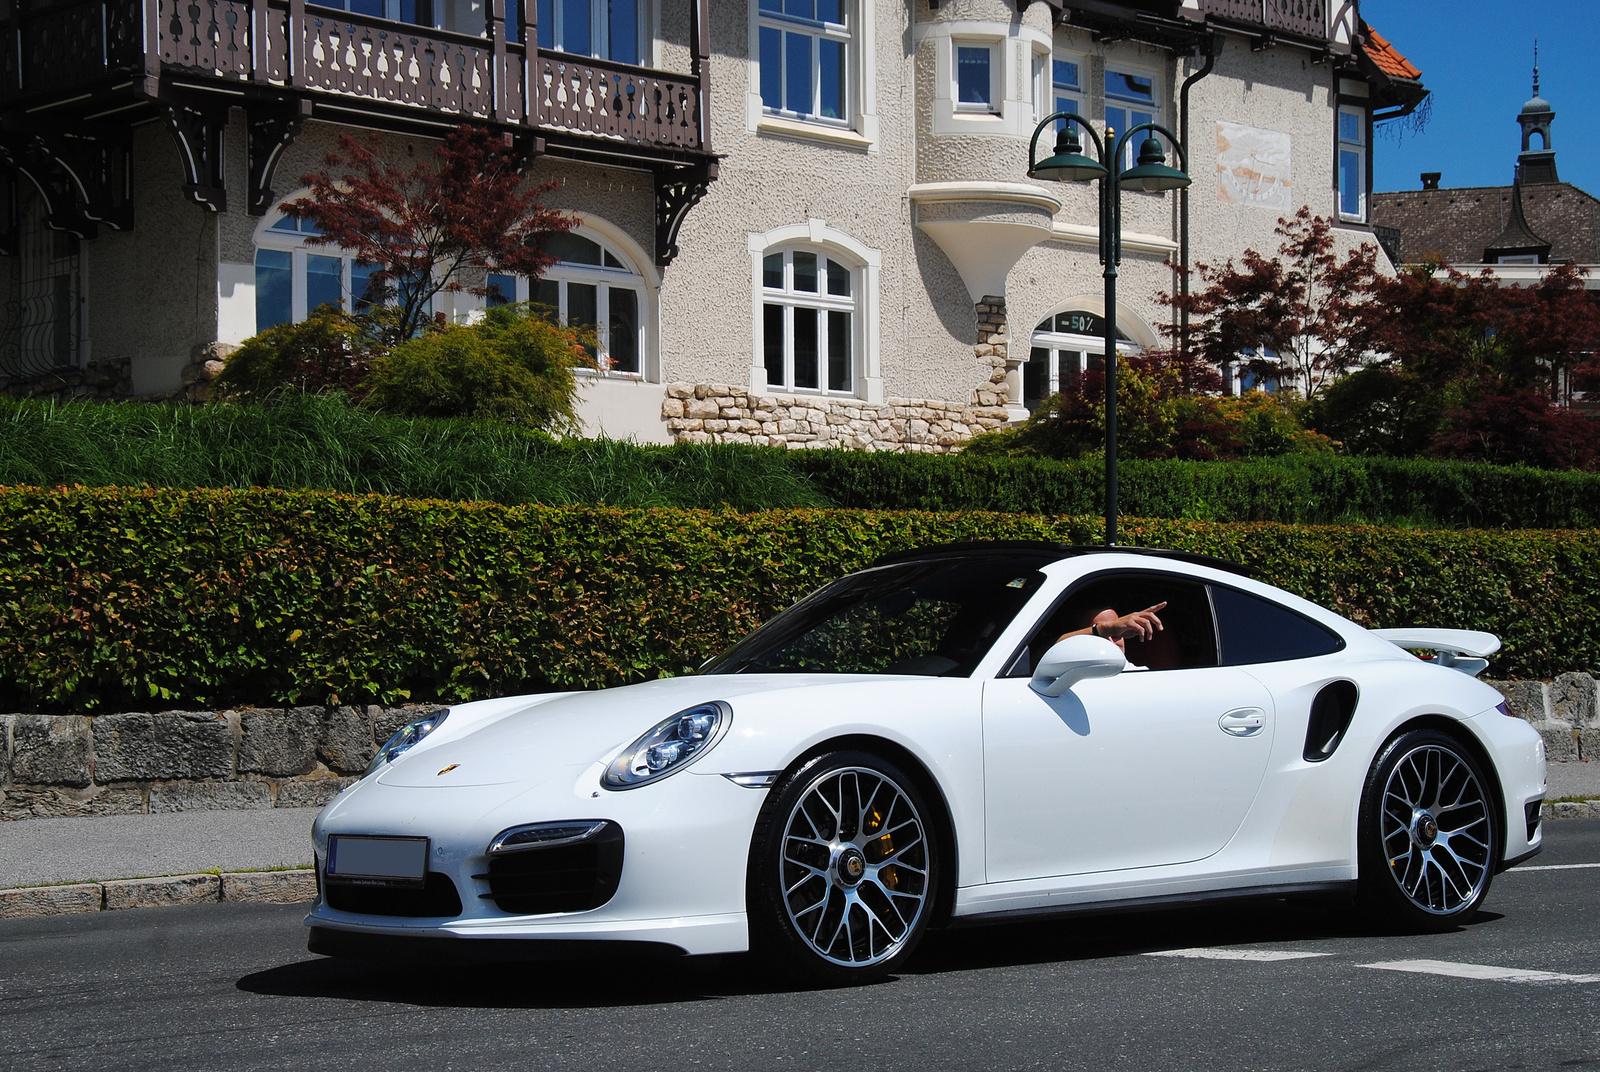 Porsche 911 (991) Turbo